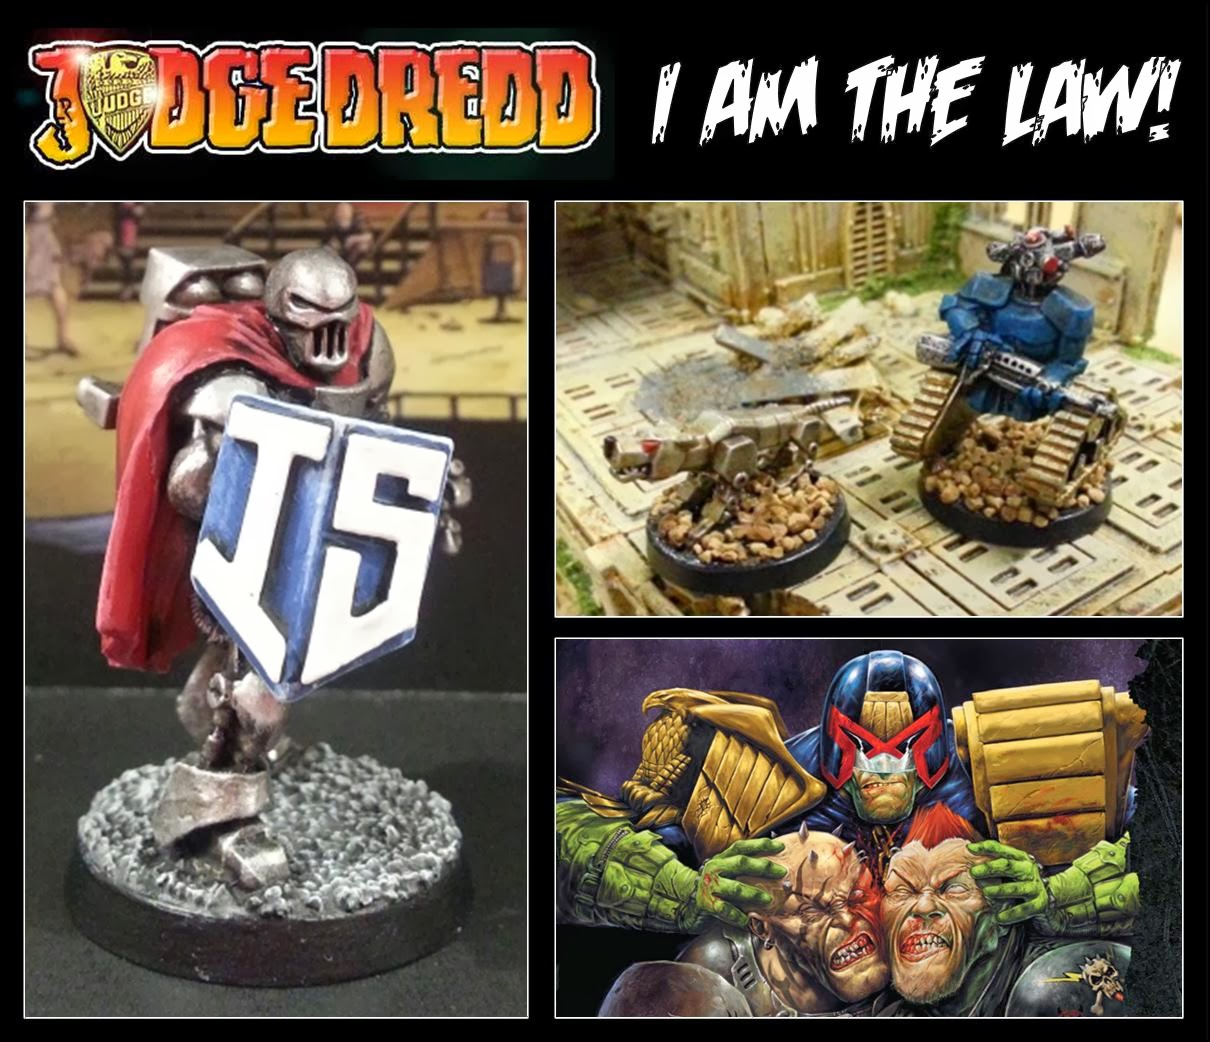 Judge Dredd...